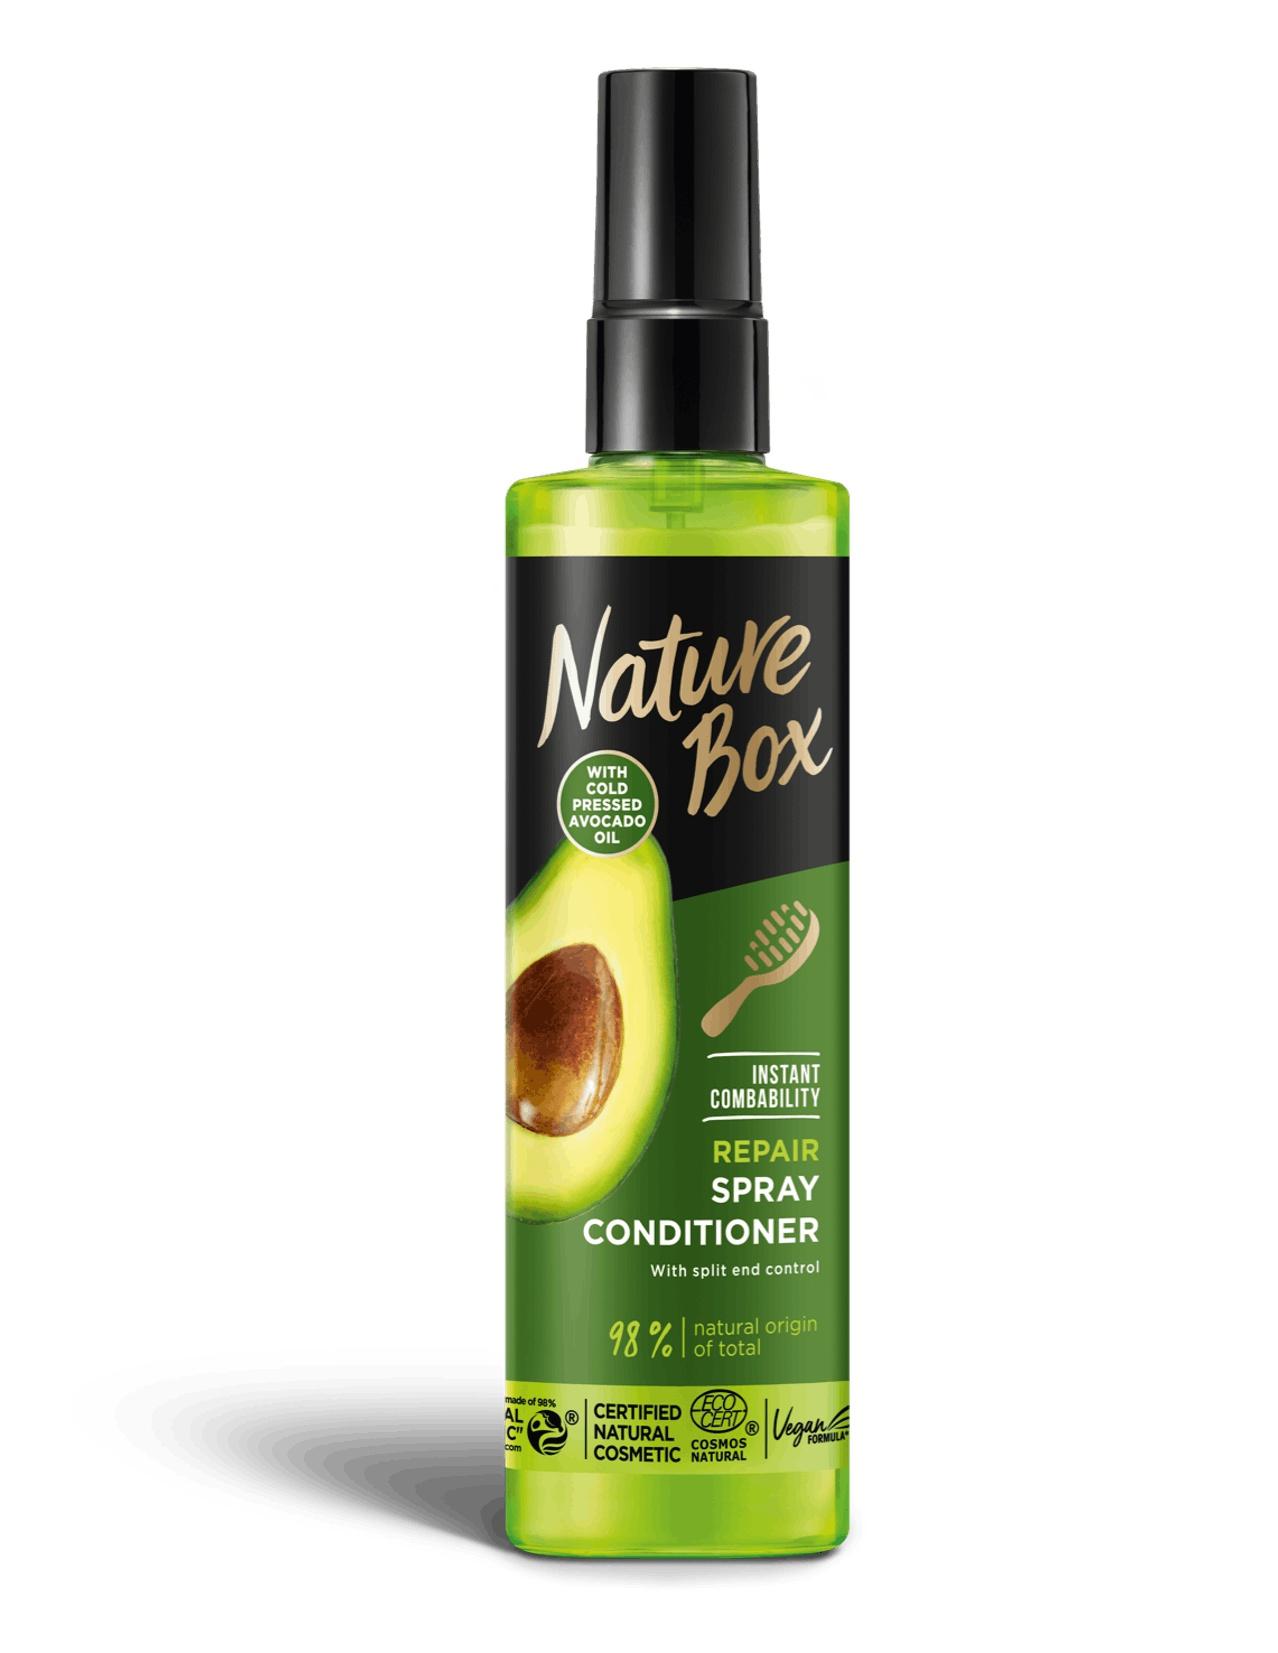 Nature box Repair Spray Conditioner Avocado Oil